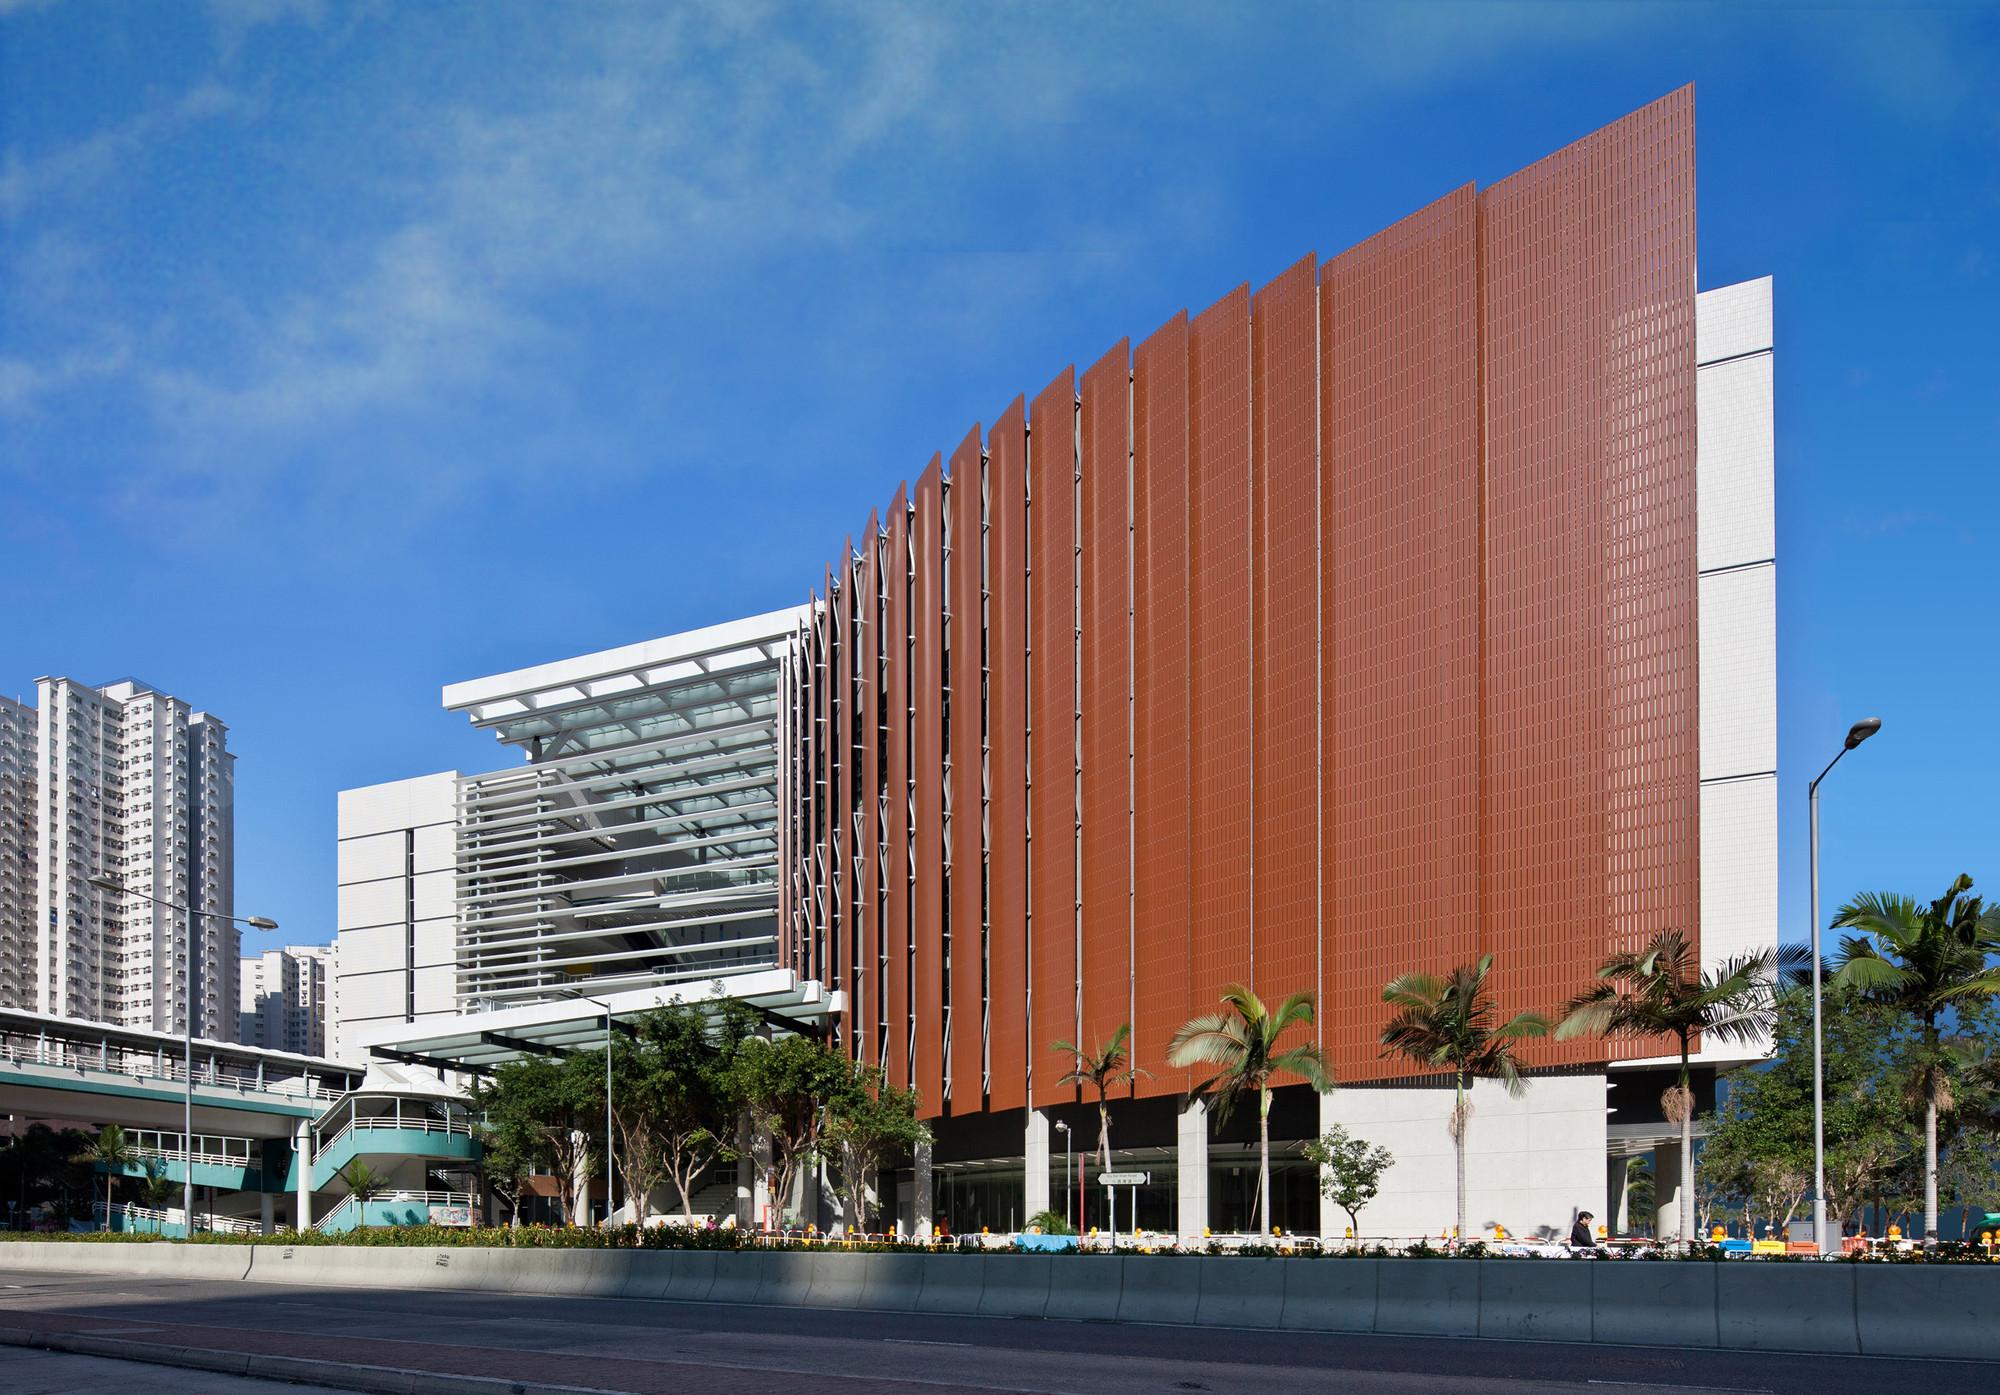 Siu Sai Wan Complex / Ronald Lu and Partners, © Ronald Lu and Partners